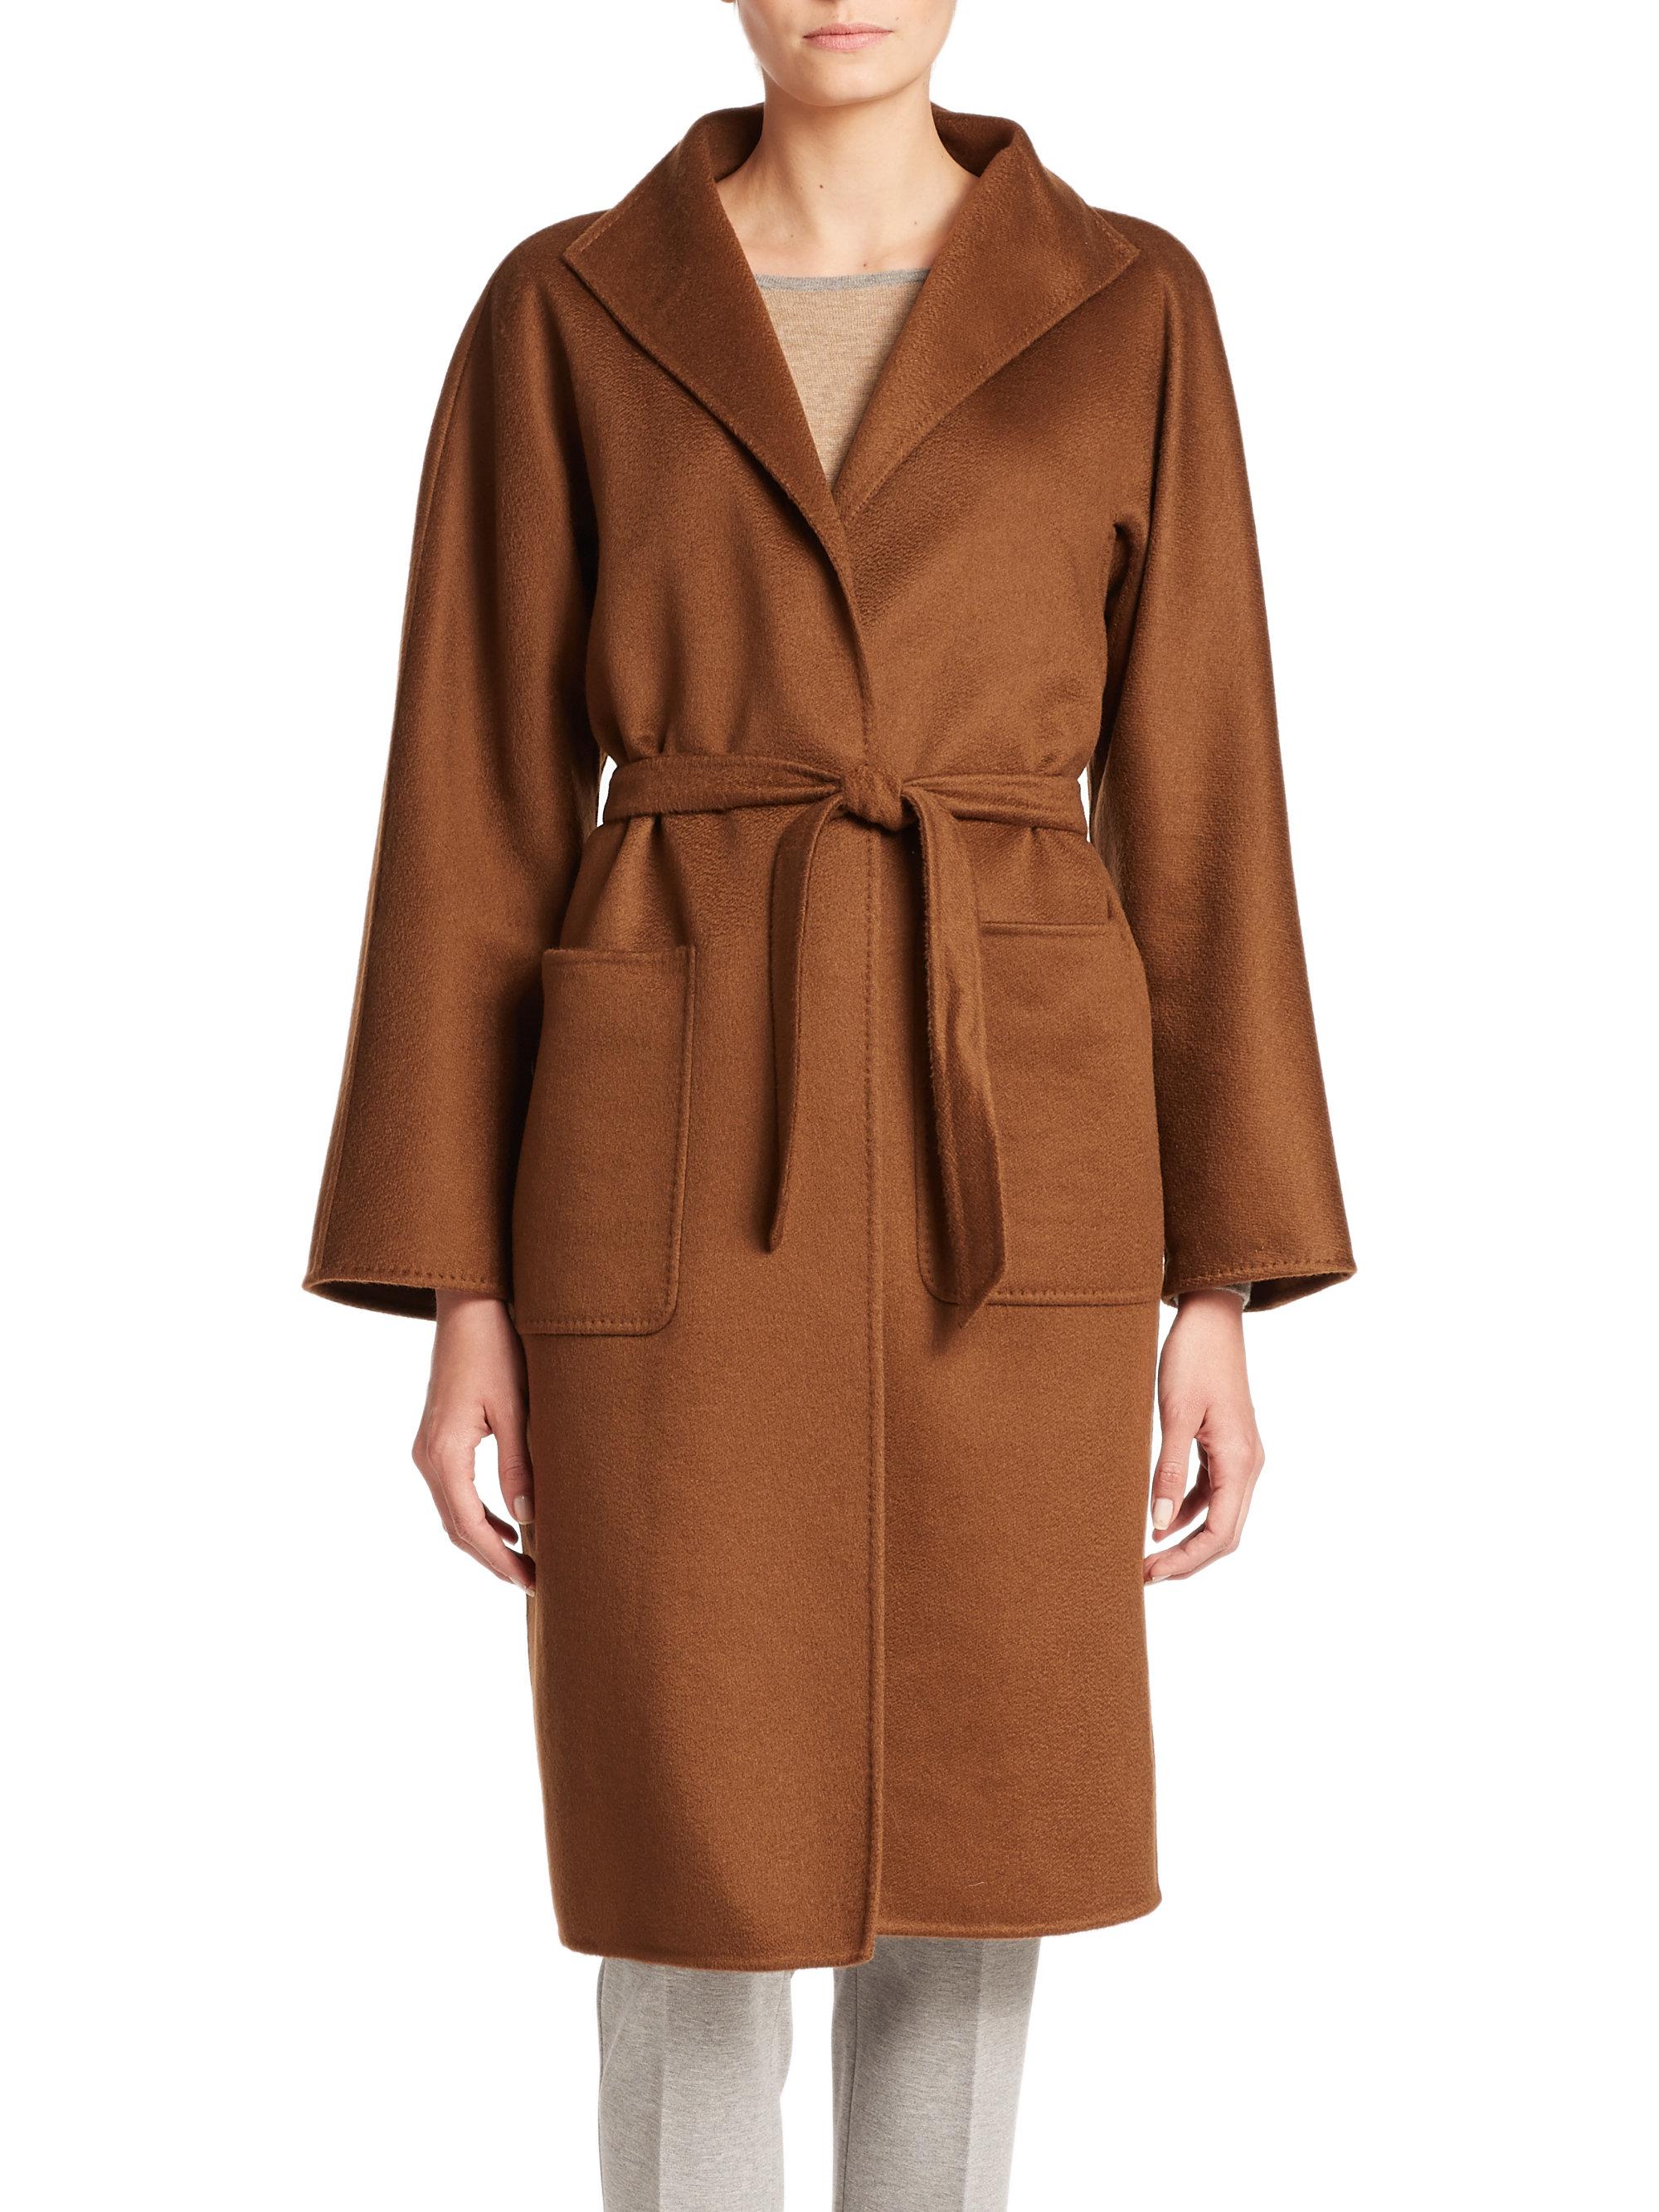 max mara lilia cashmere wrap coat in brown tobacco lyst. Black Bedroom Furniture Sets. Home Design Ideas